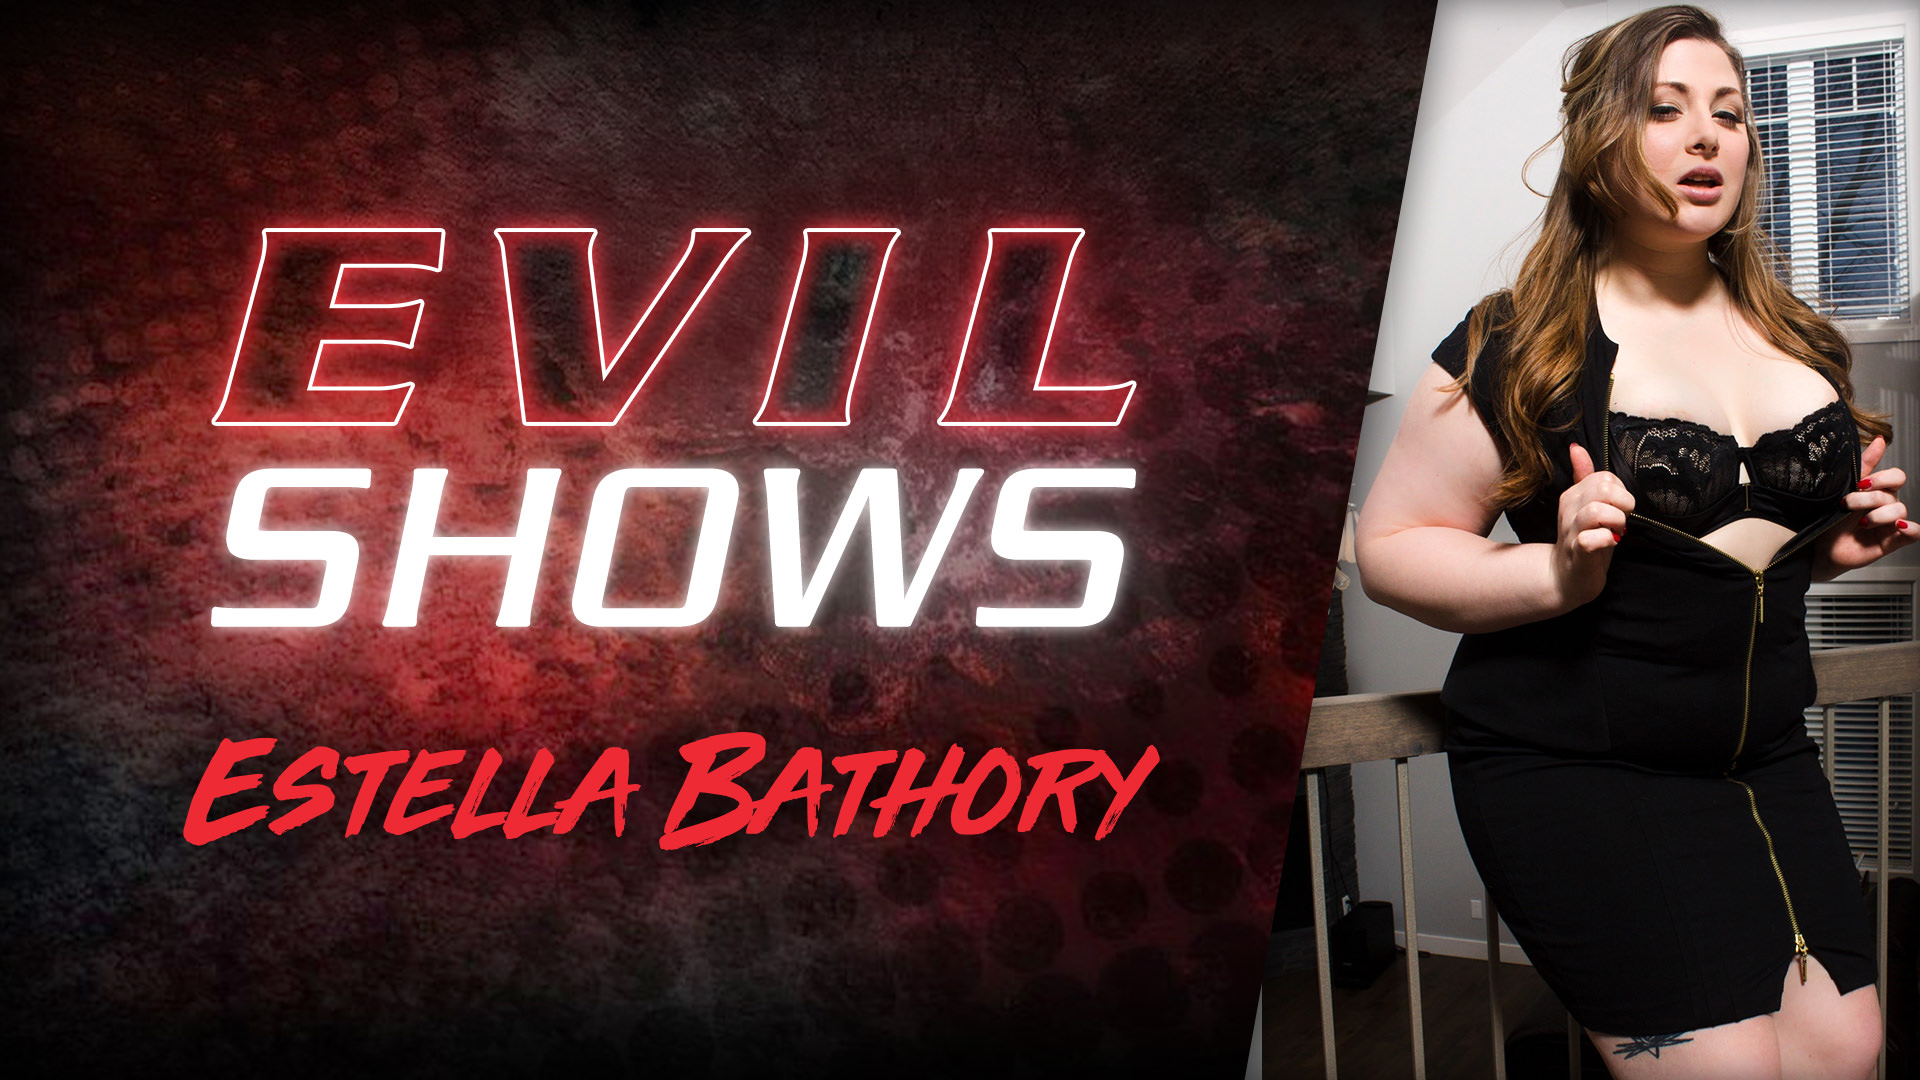 Evil Shows - Estella Bathory - Estella Bathory 1